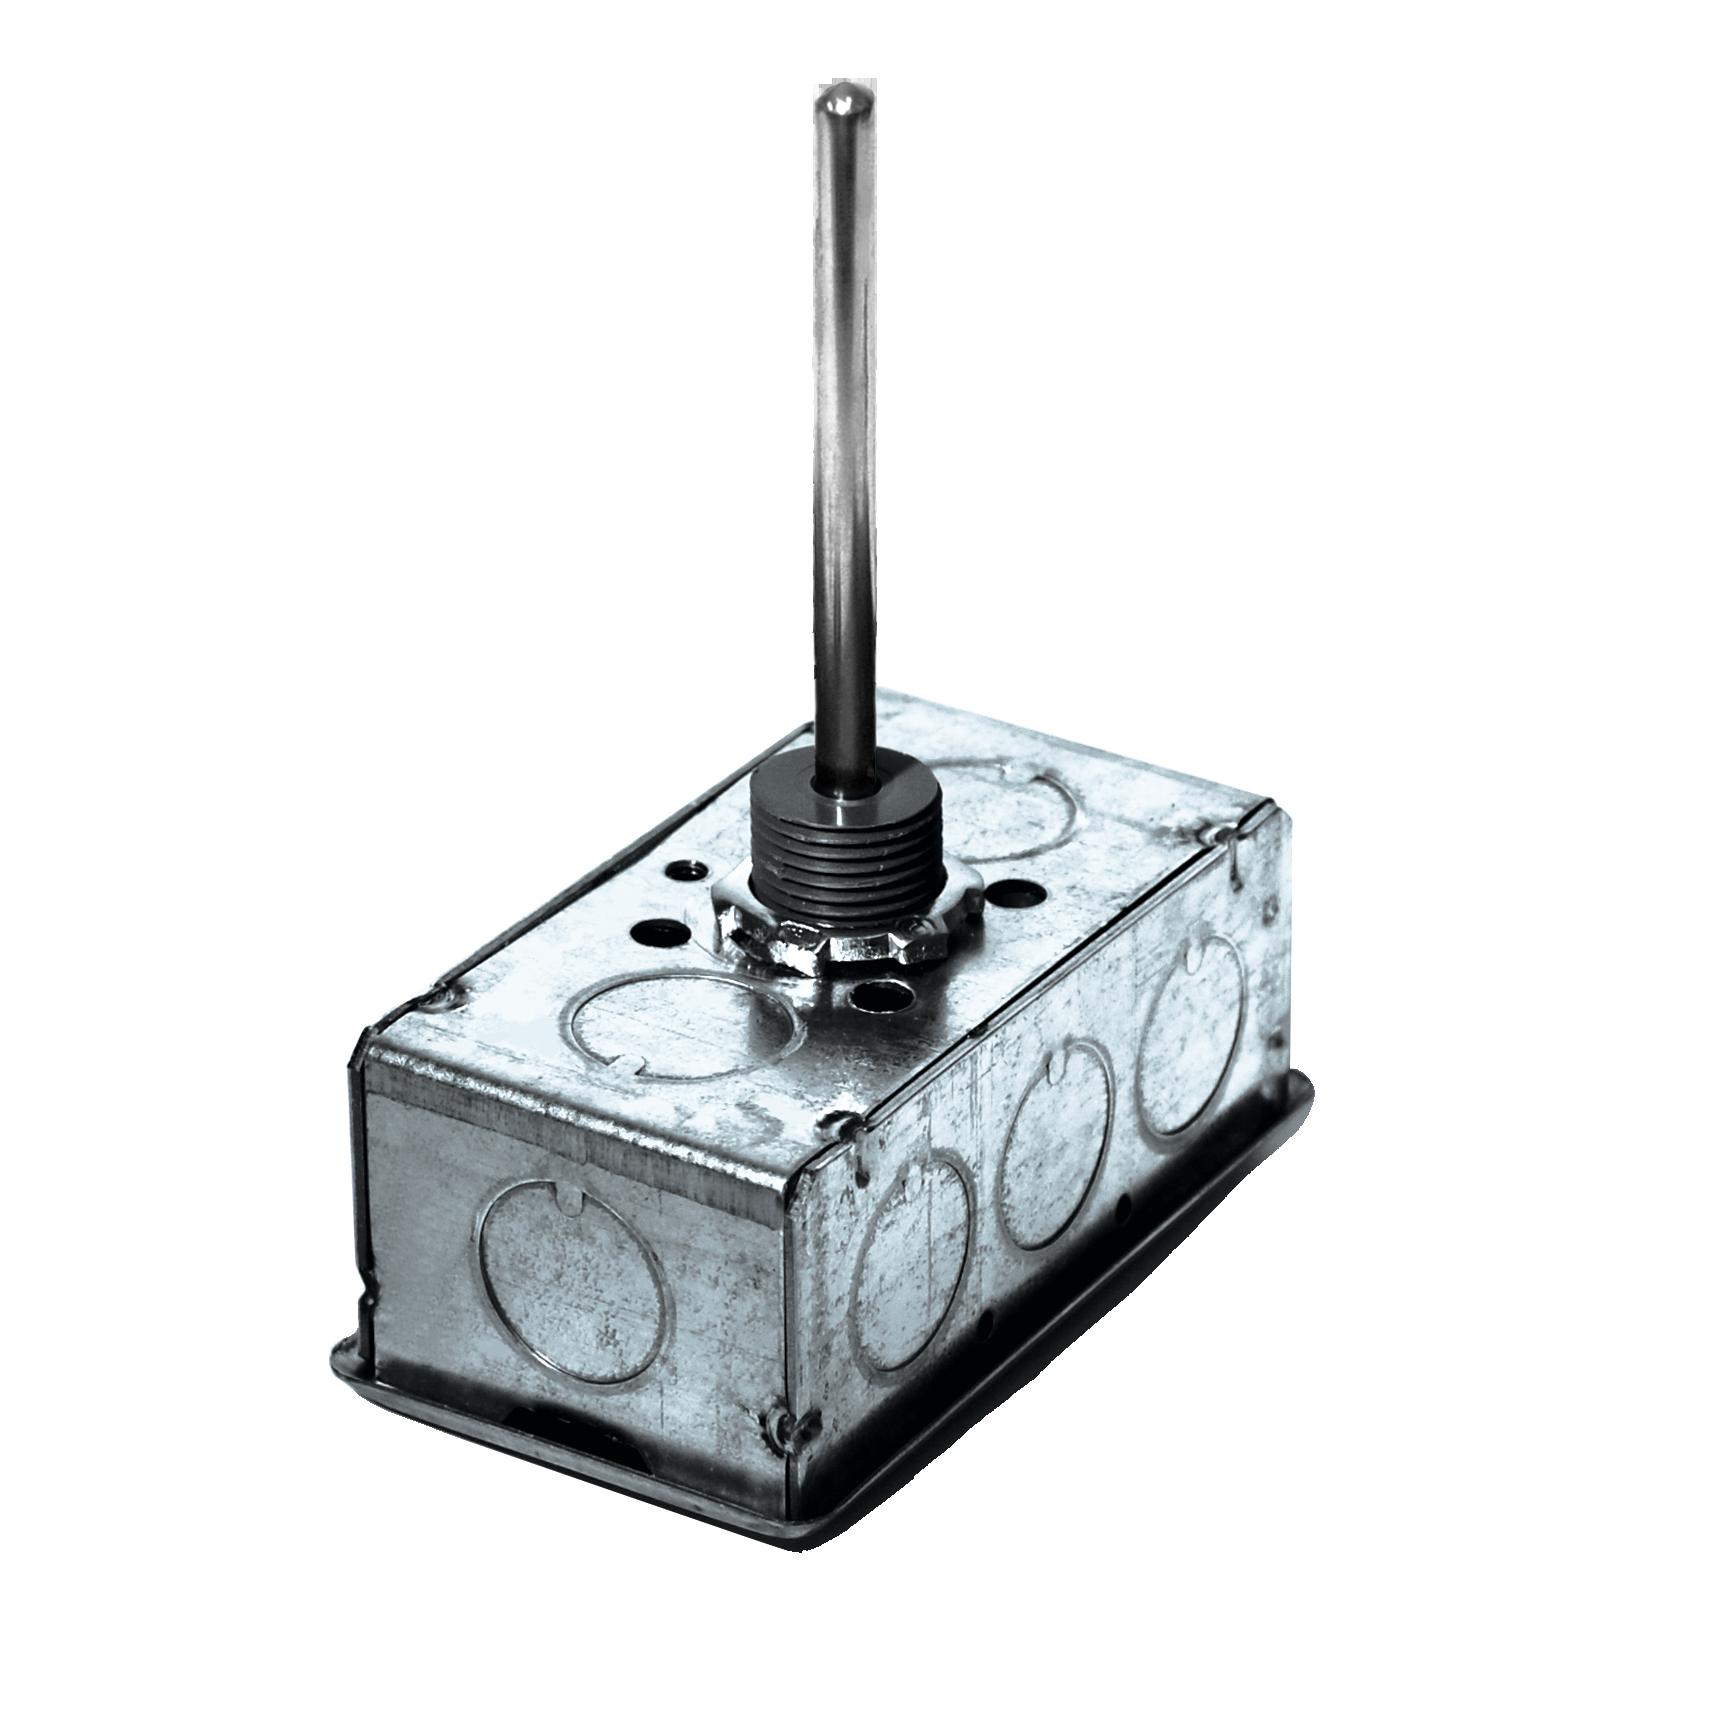 "ACI A/AN-INW-2.5""-GD Immersion Temperature Sensor"